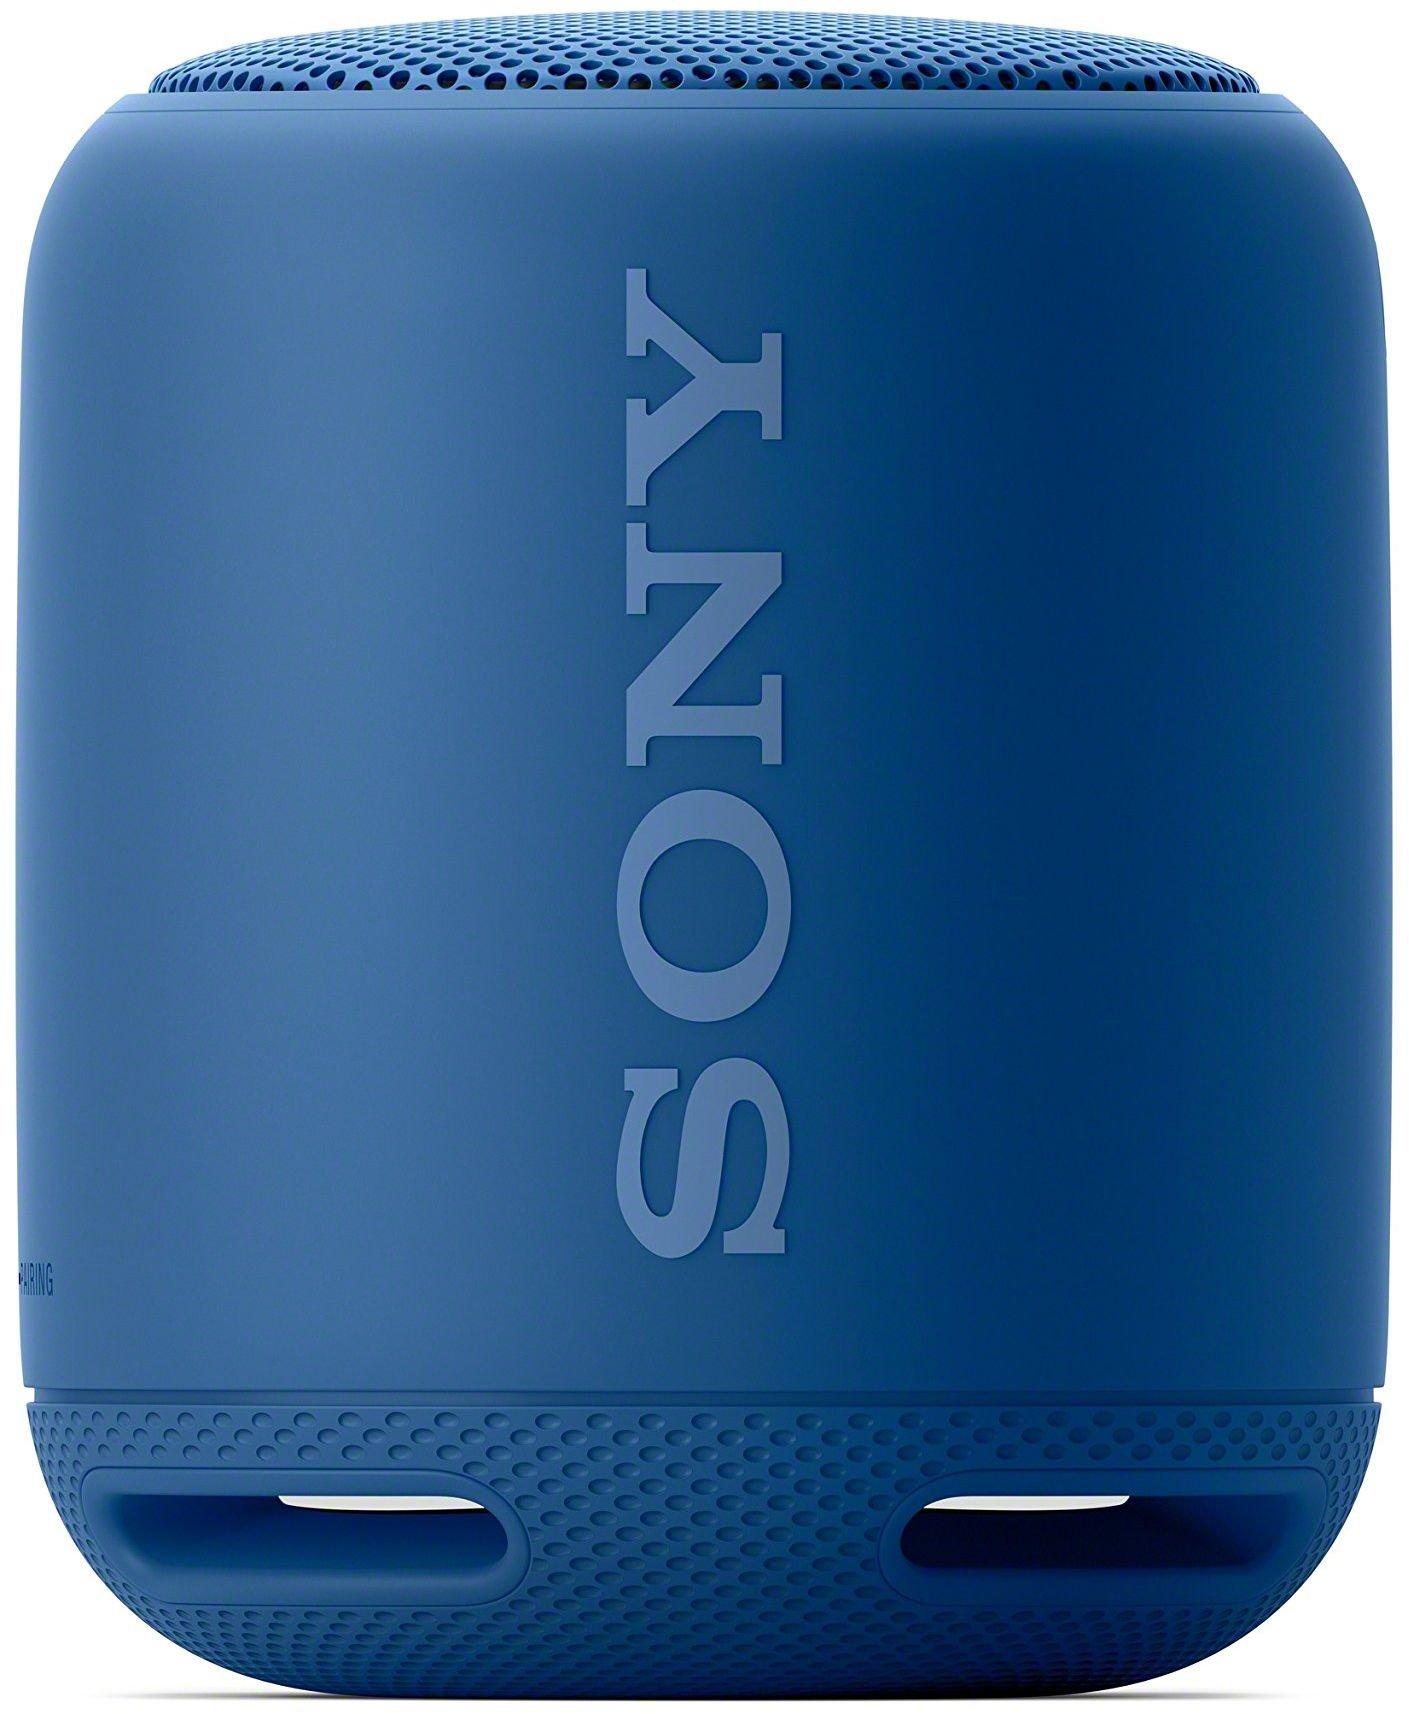 Sony Portable Wireless Speaker Bluetooth